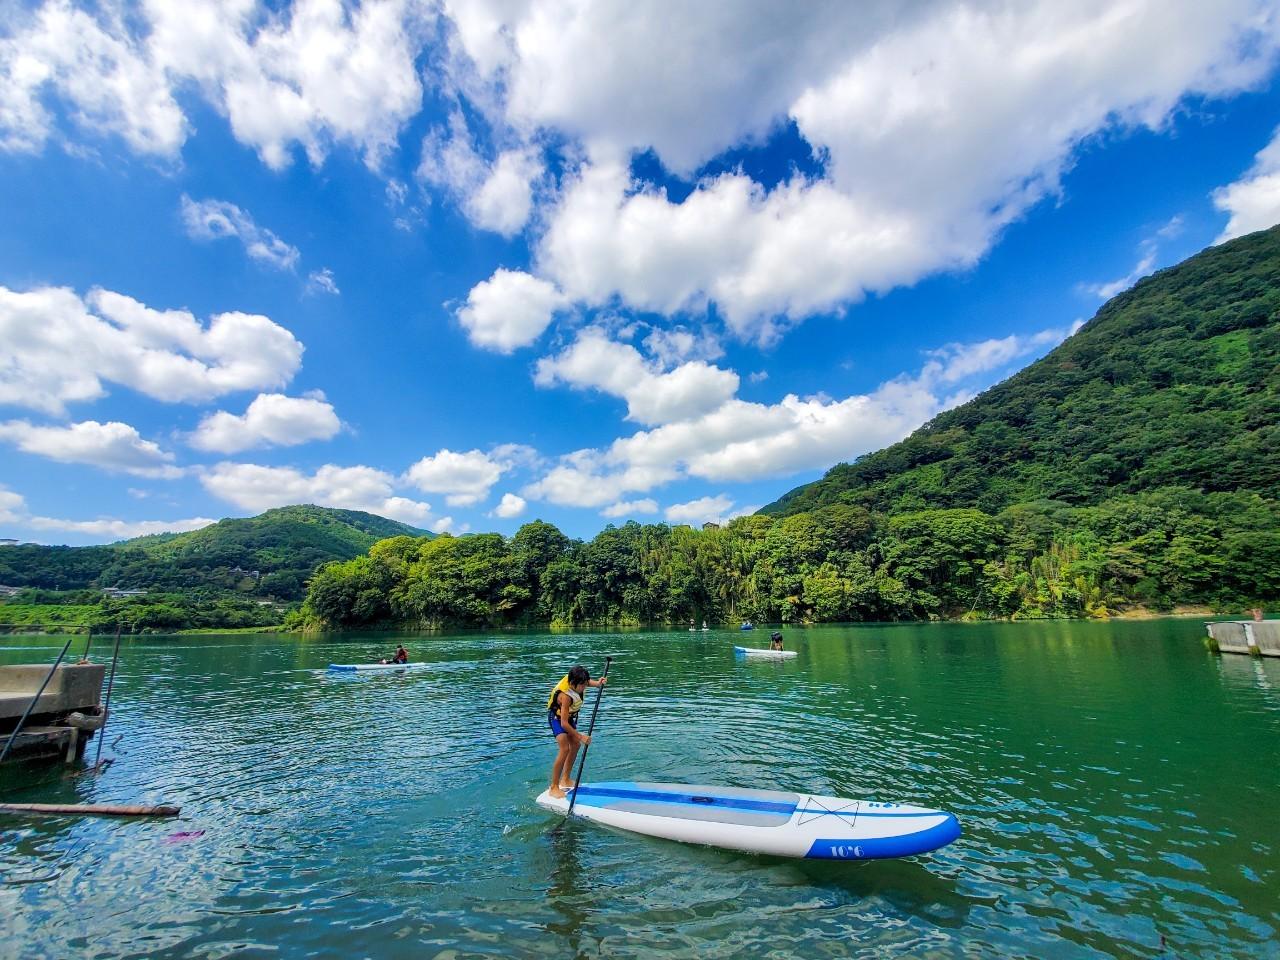 Lake Ikeda ทะเลสาบสำหรับคนรักกิจกรรมแอดเวนเจอร์